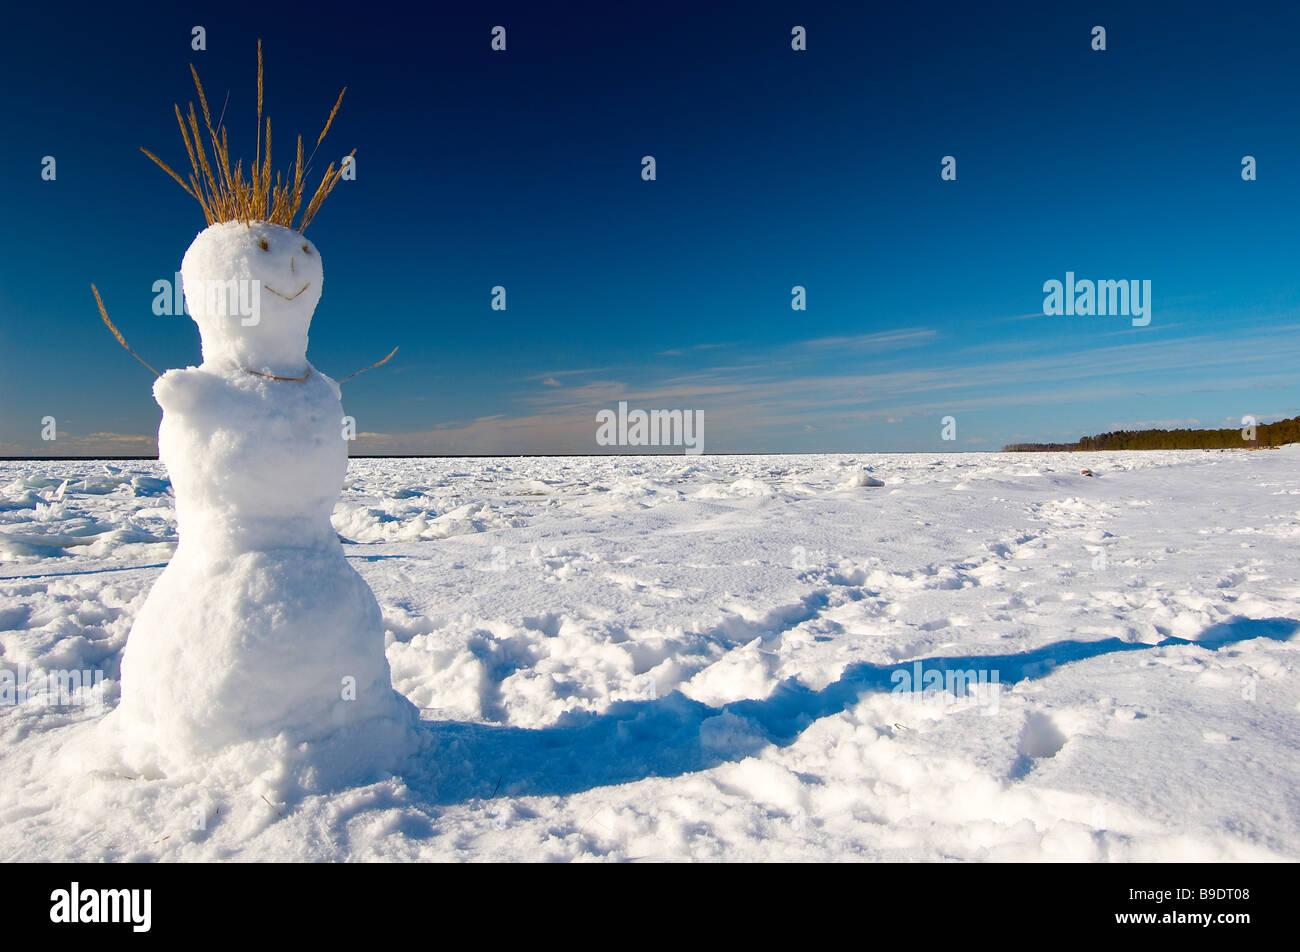 Snowman on the winter beach - Stock Image